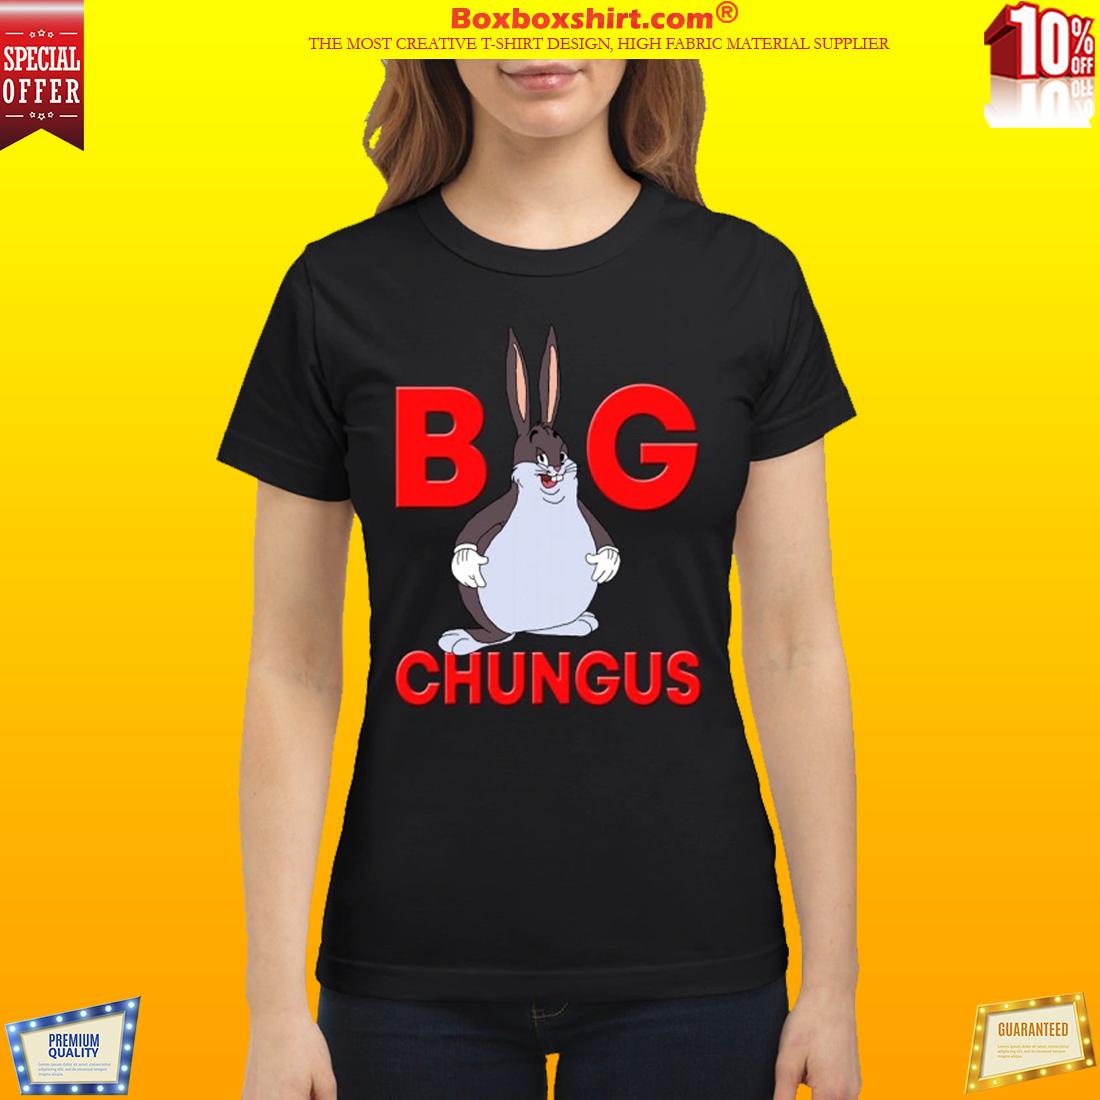 Fat Bunny Big Chungus classic t shirt